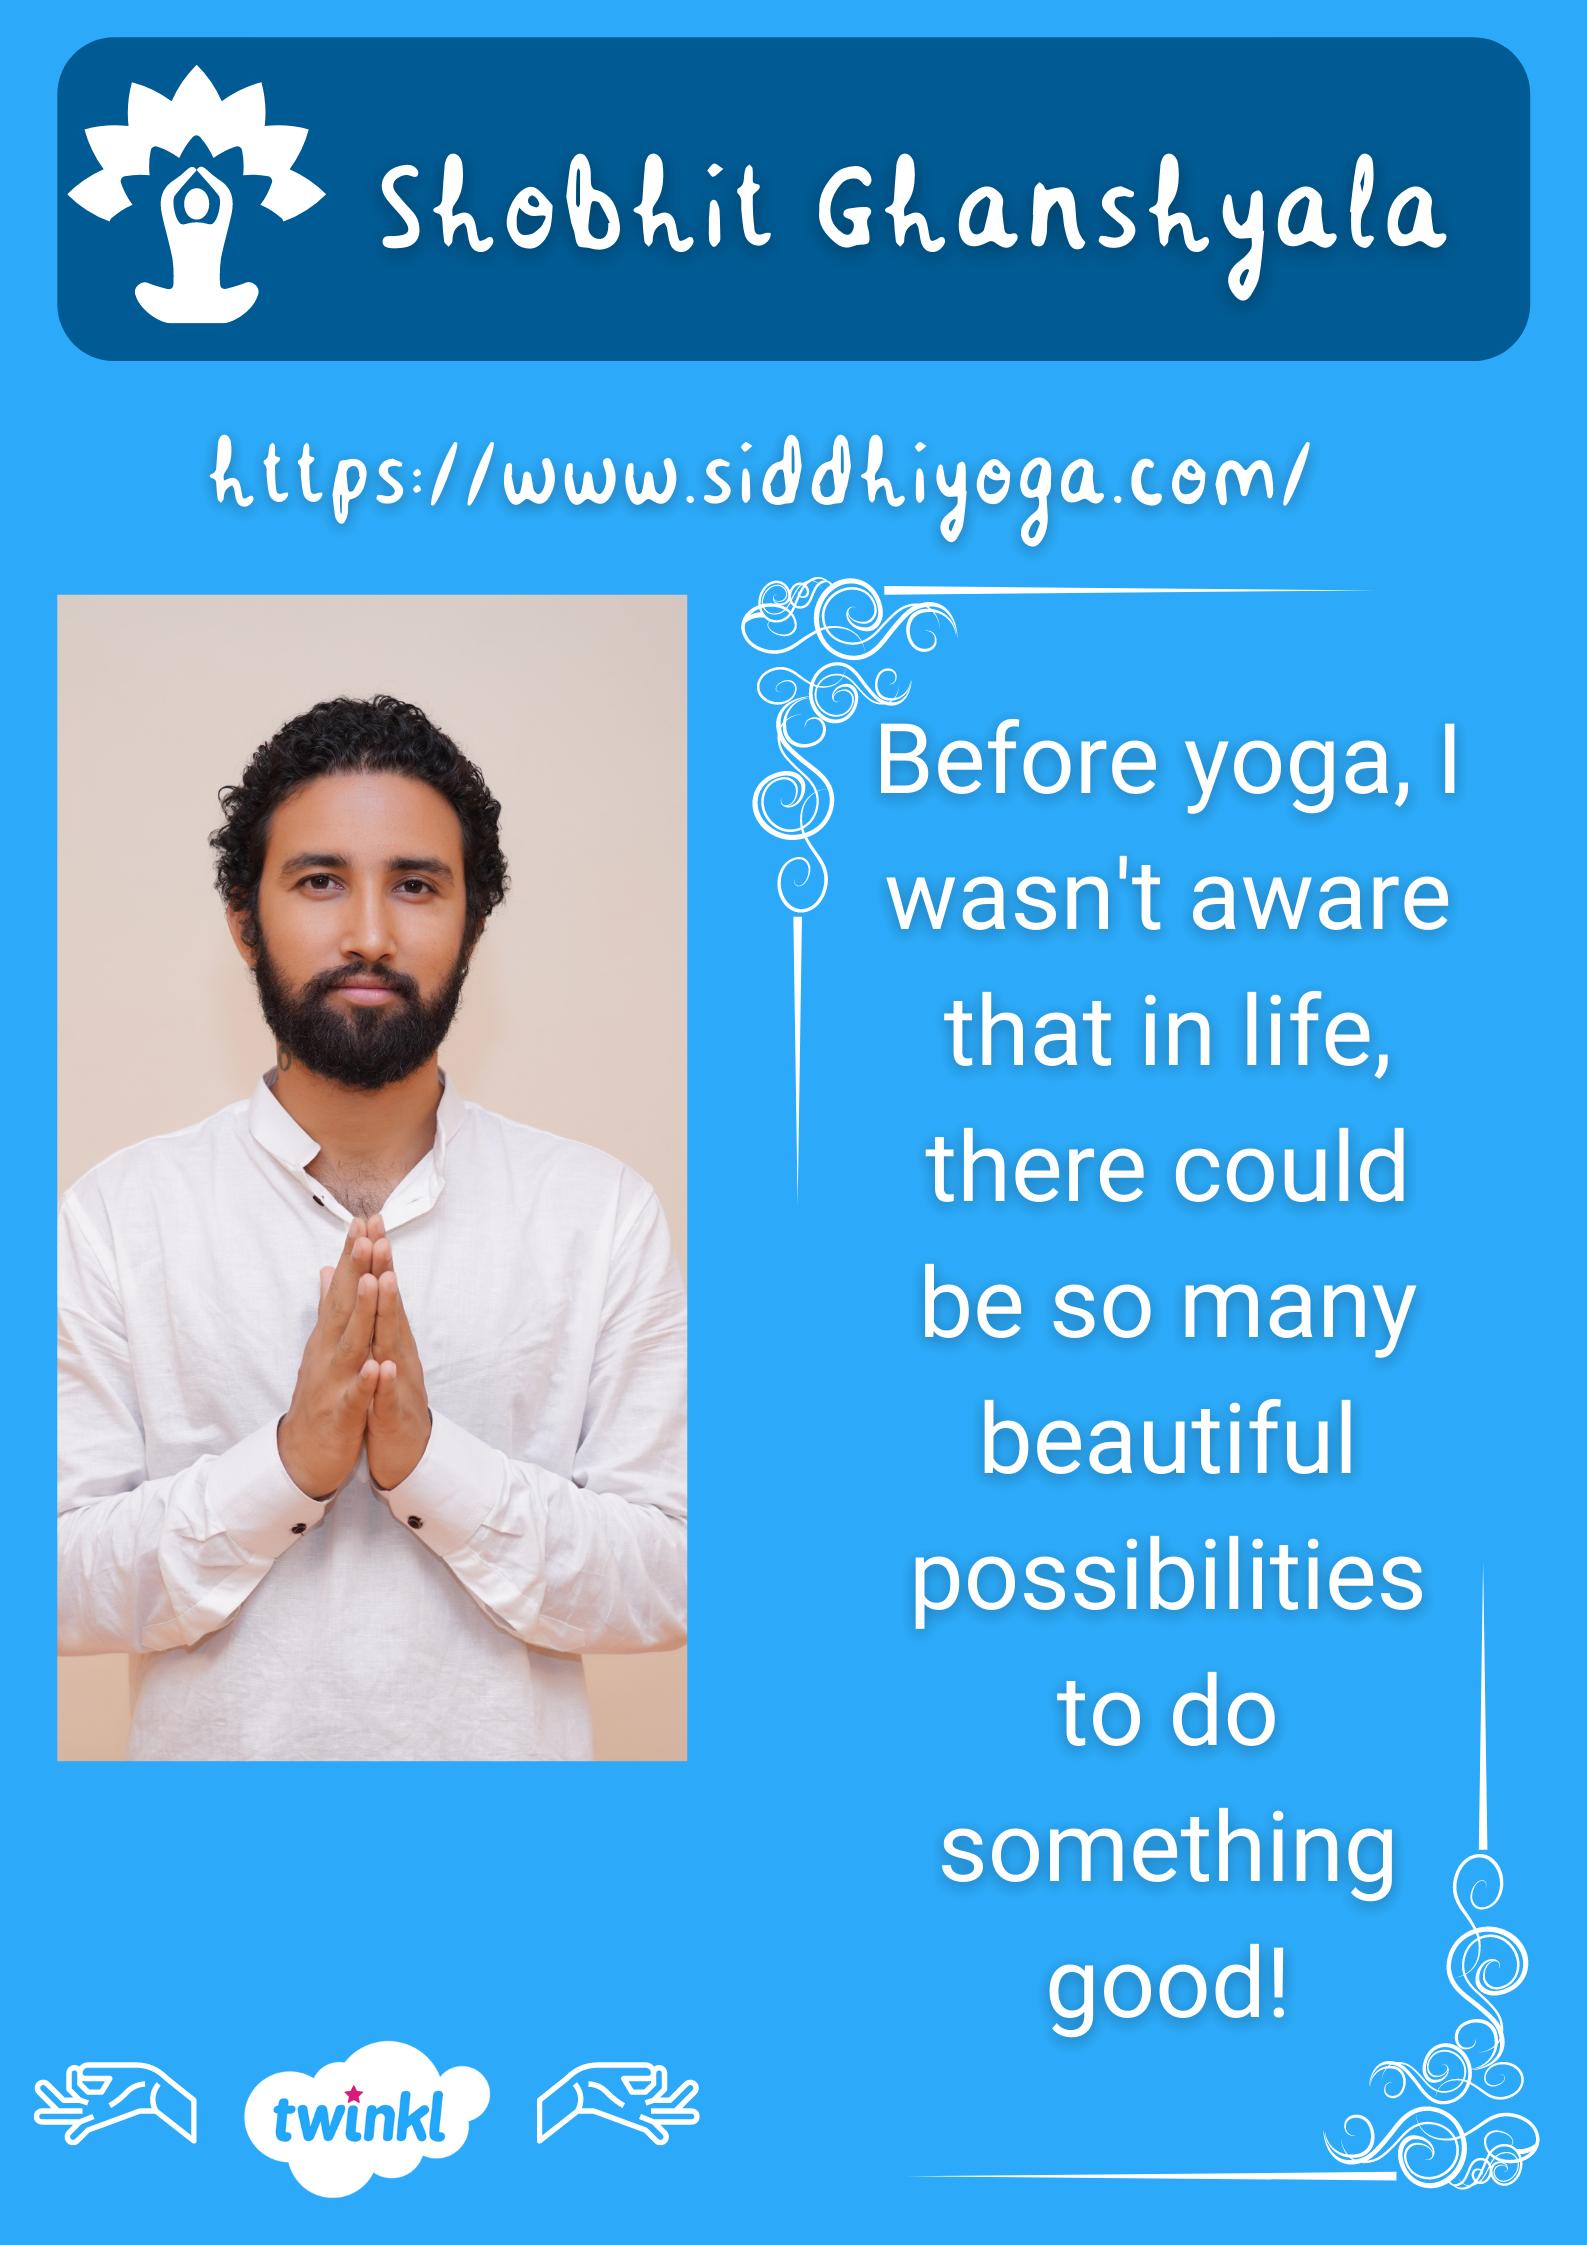 Shobhit siddhi yoga institute